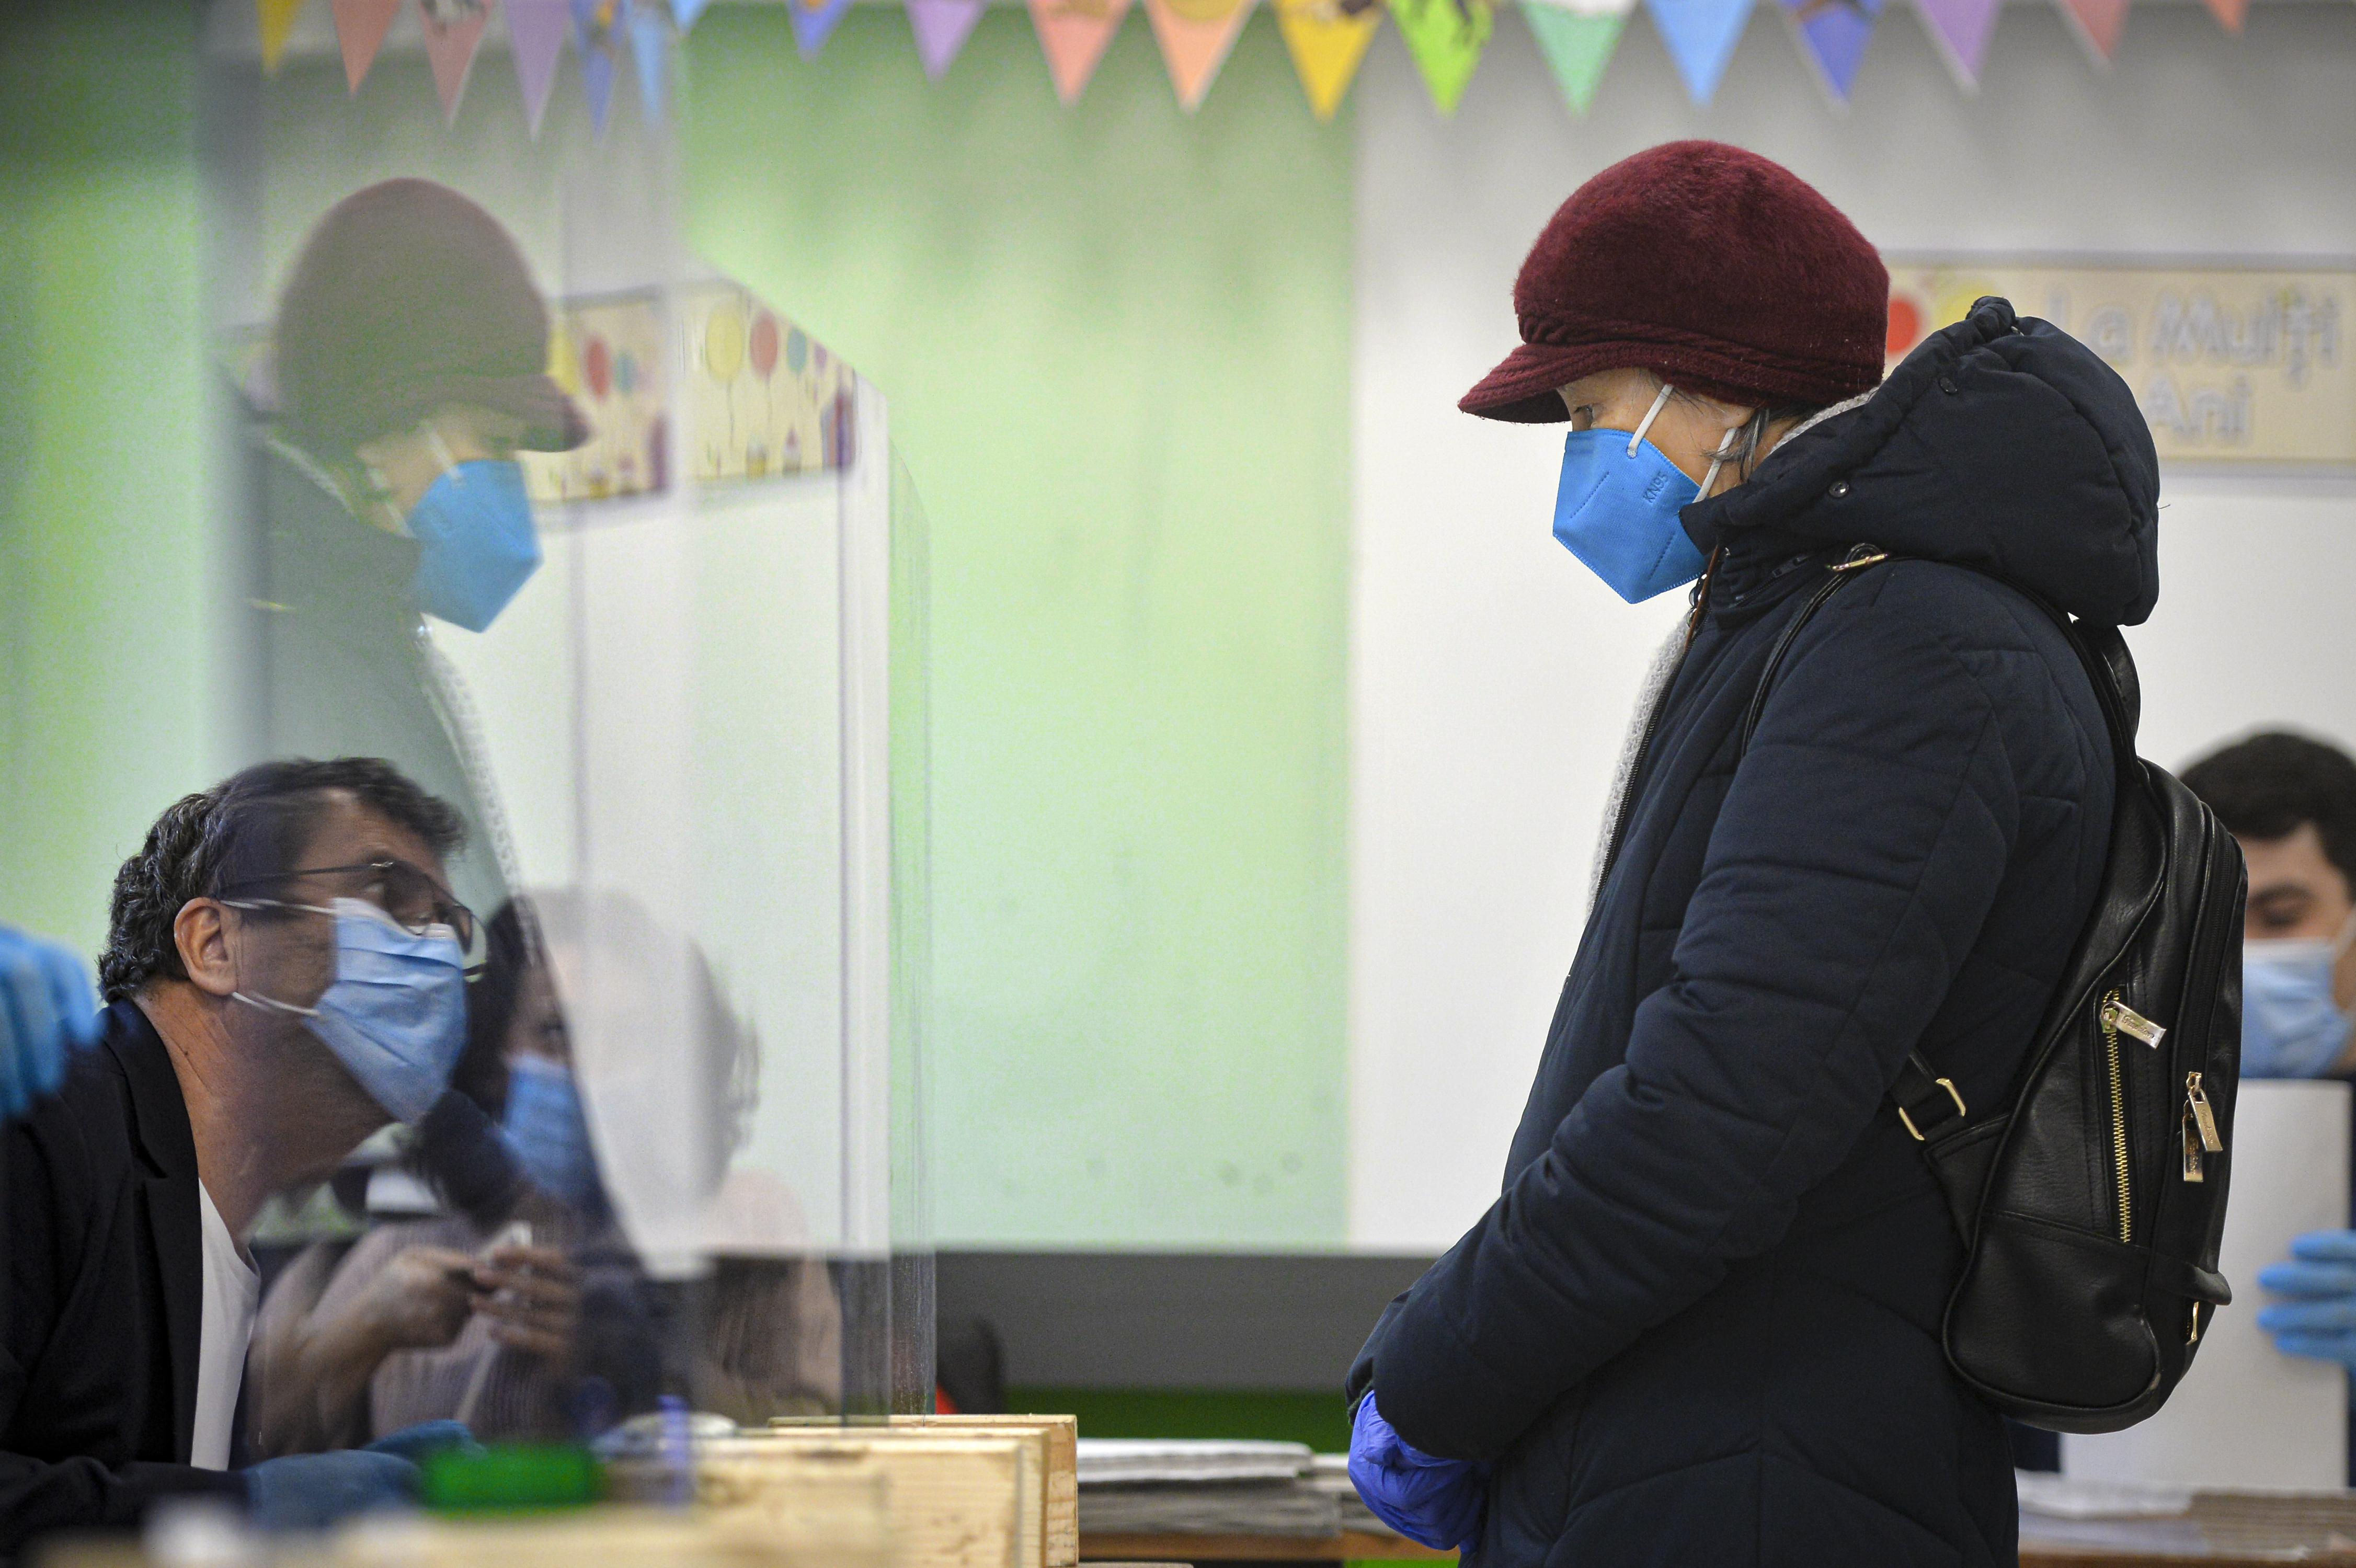 Romanians elect new lawmakers, seek end to political turmoil